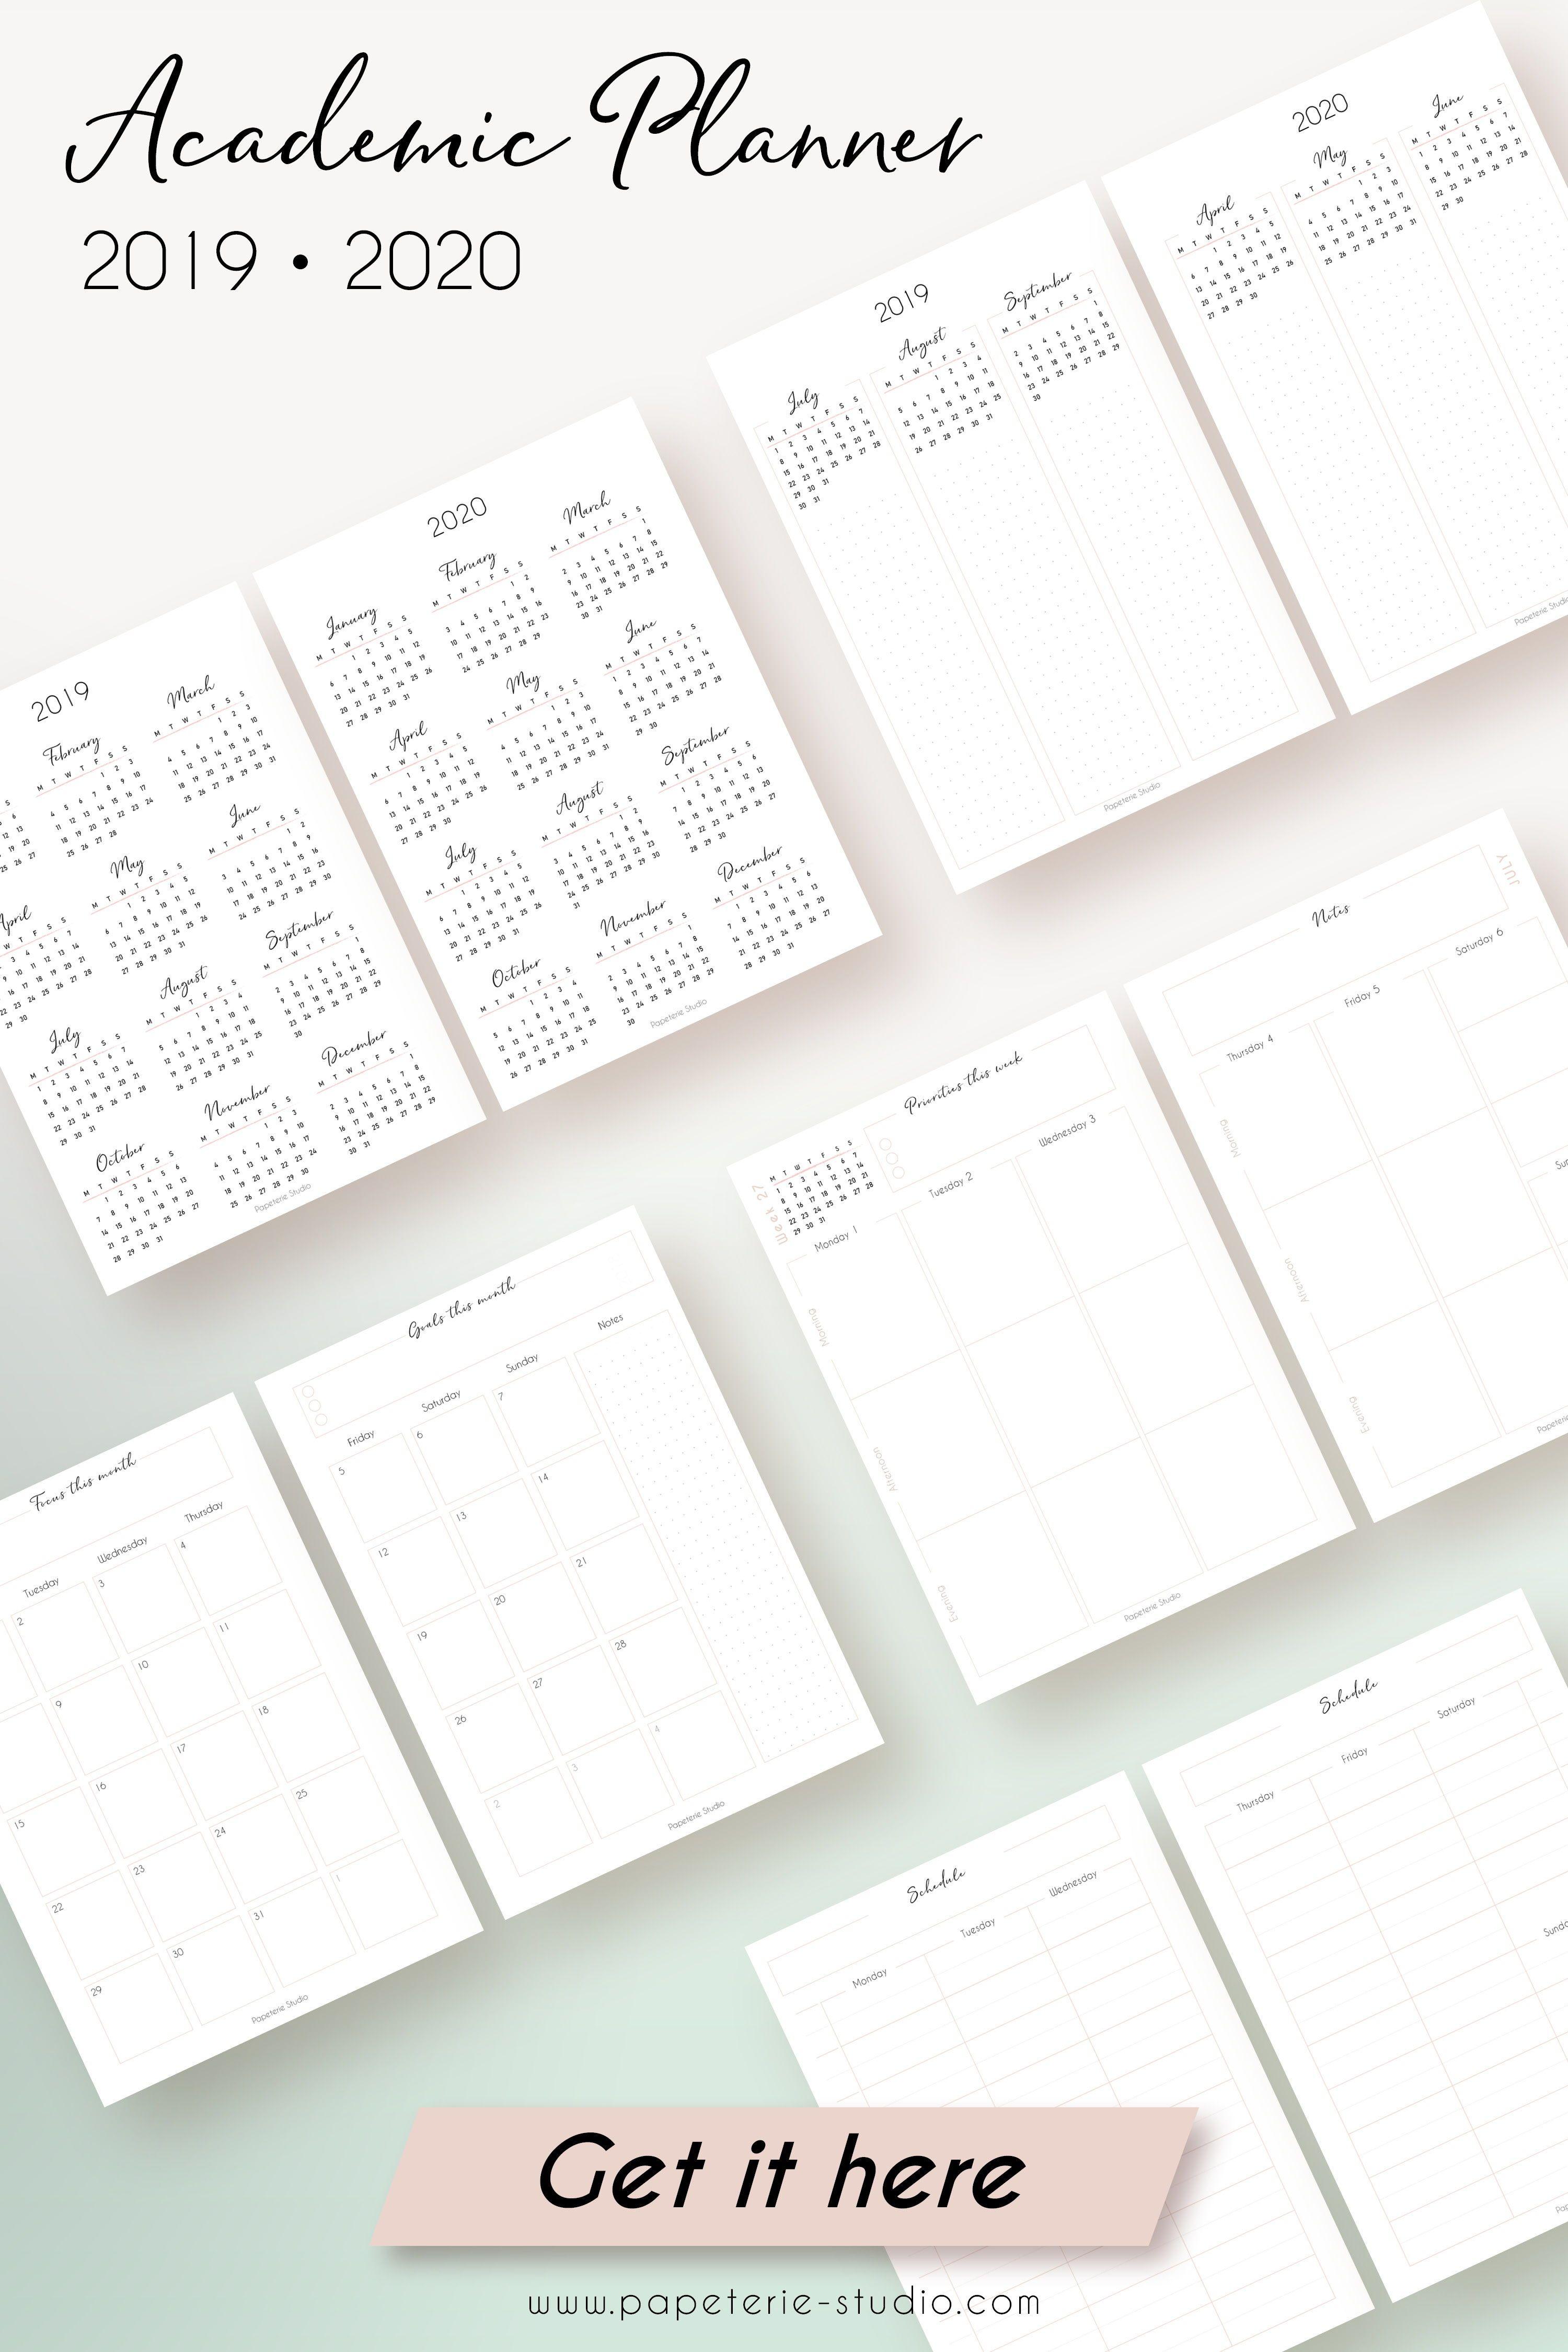 Printable Academic Planner 2019 2020 By Papeteriestudio College